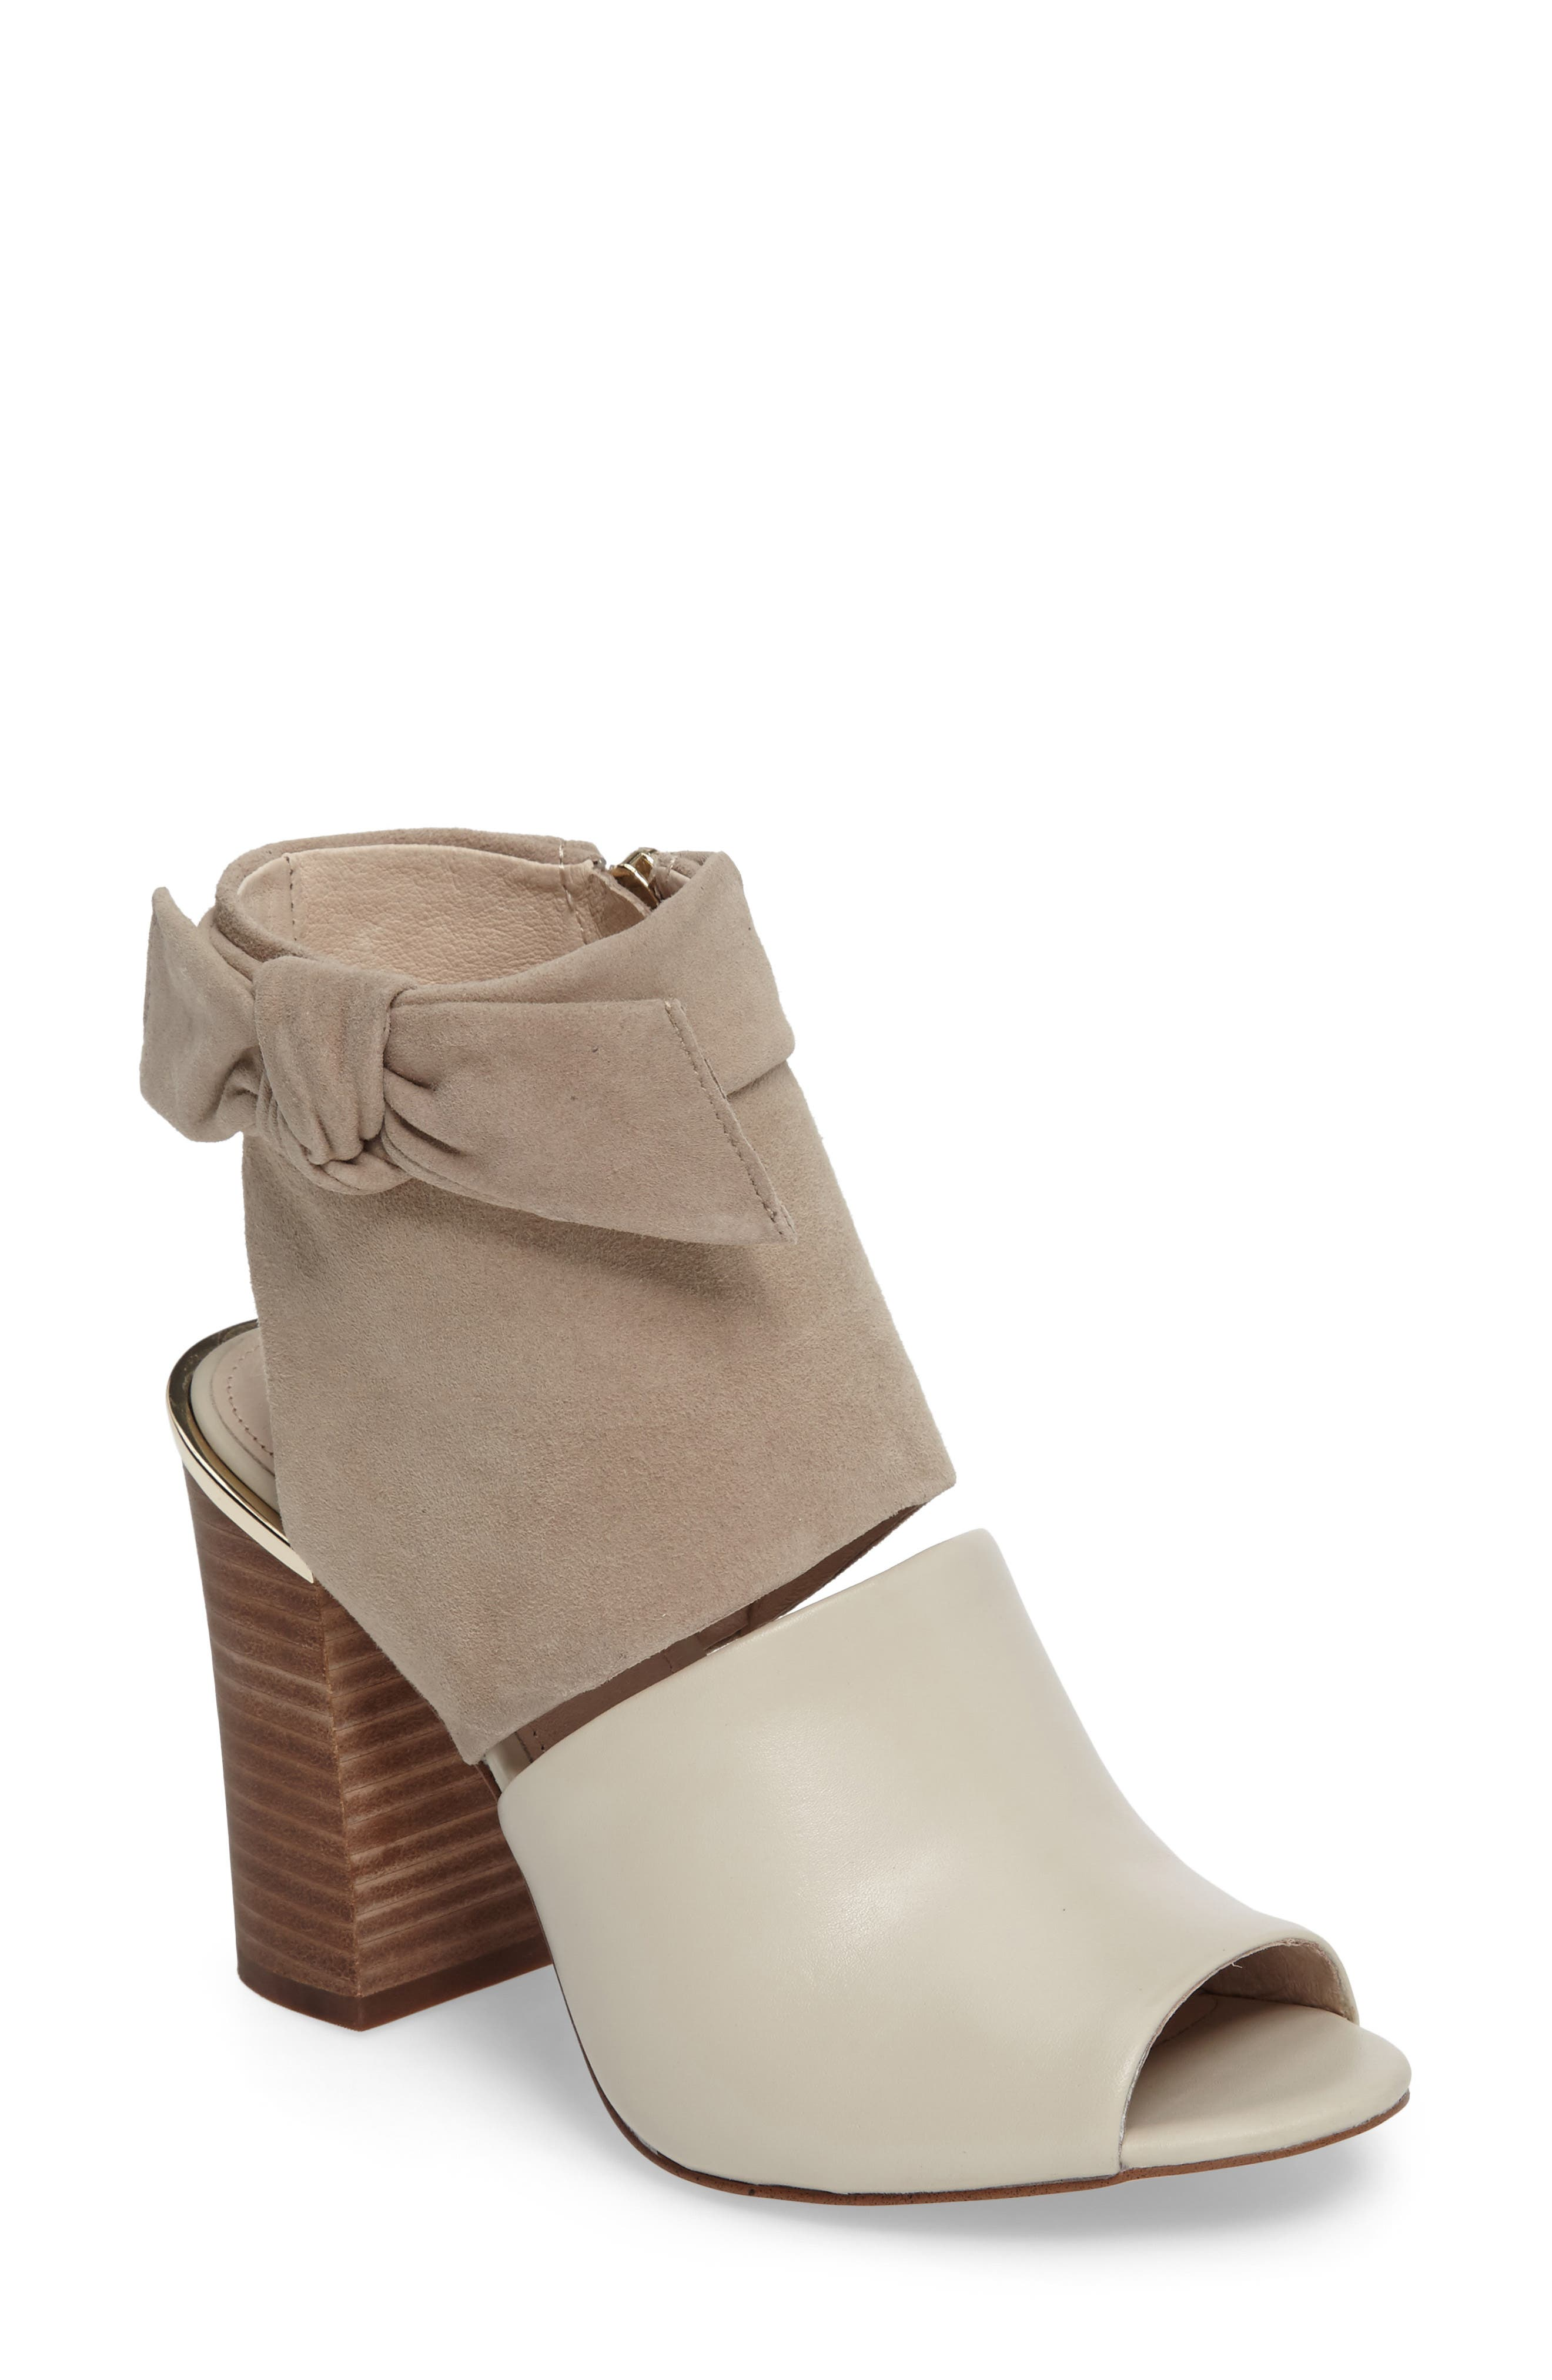 Main Image - Louise et Cit Katlin Block Heel Sandal (Women)